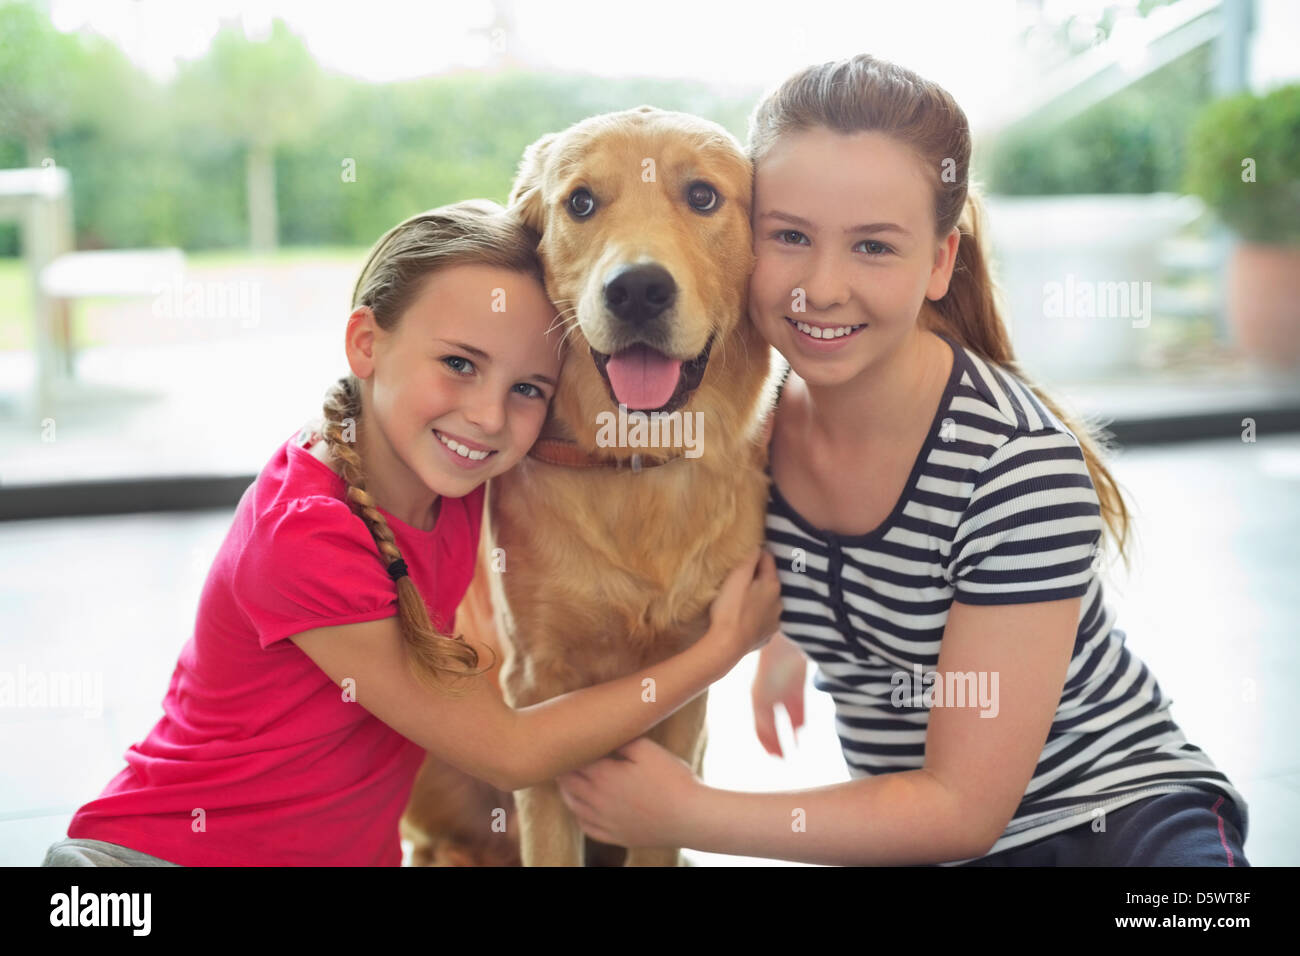 Smiling girls hugging dog indoors Stock Photo